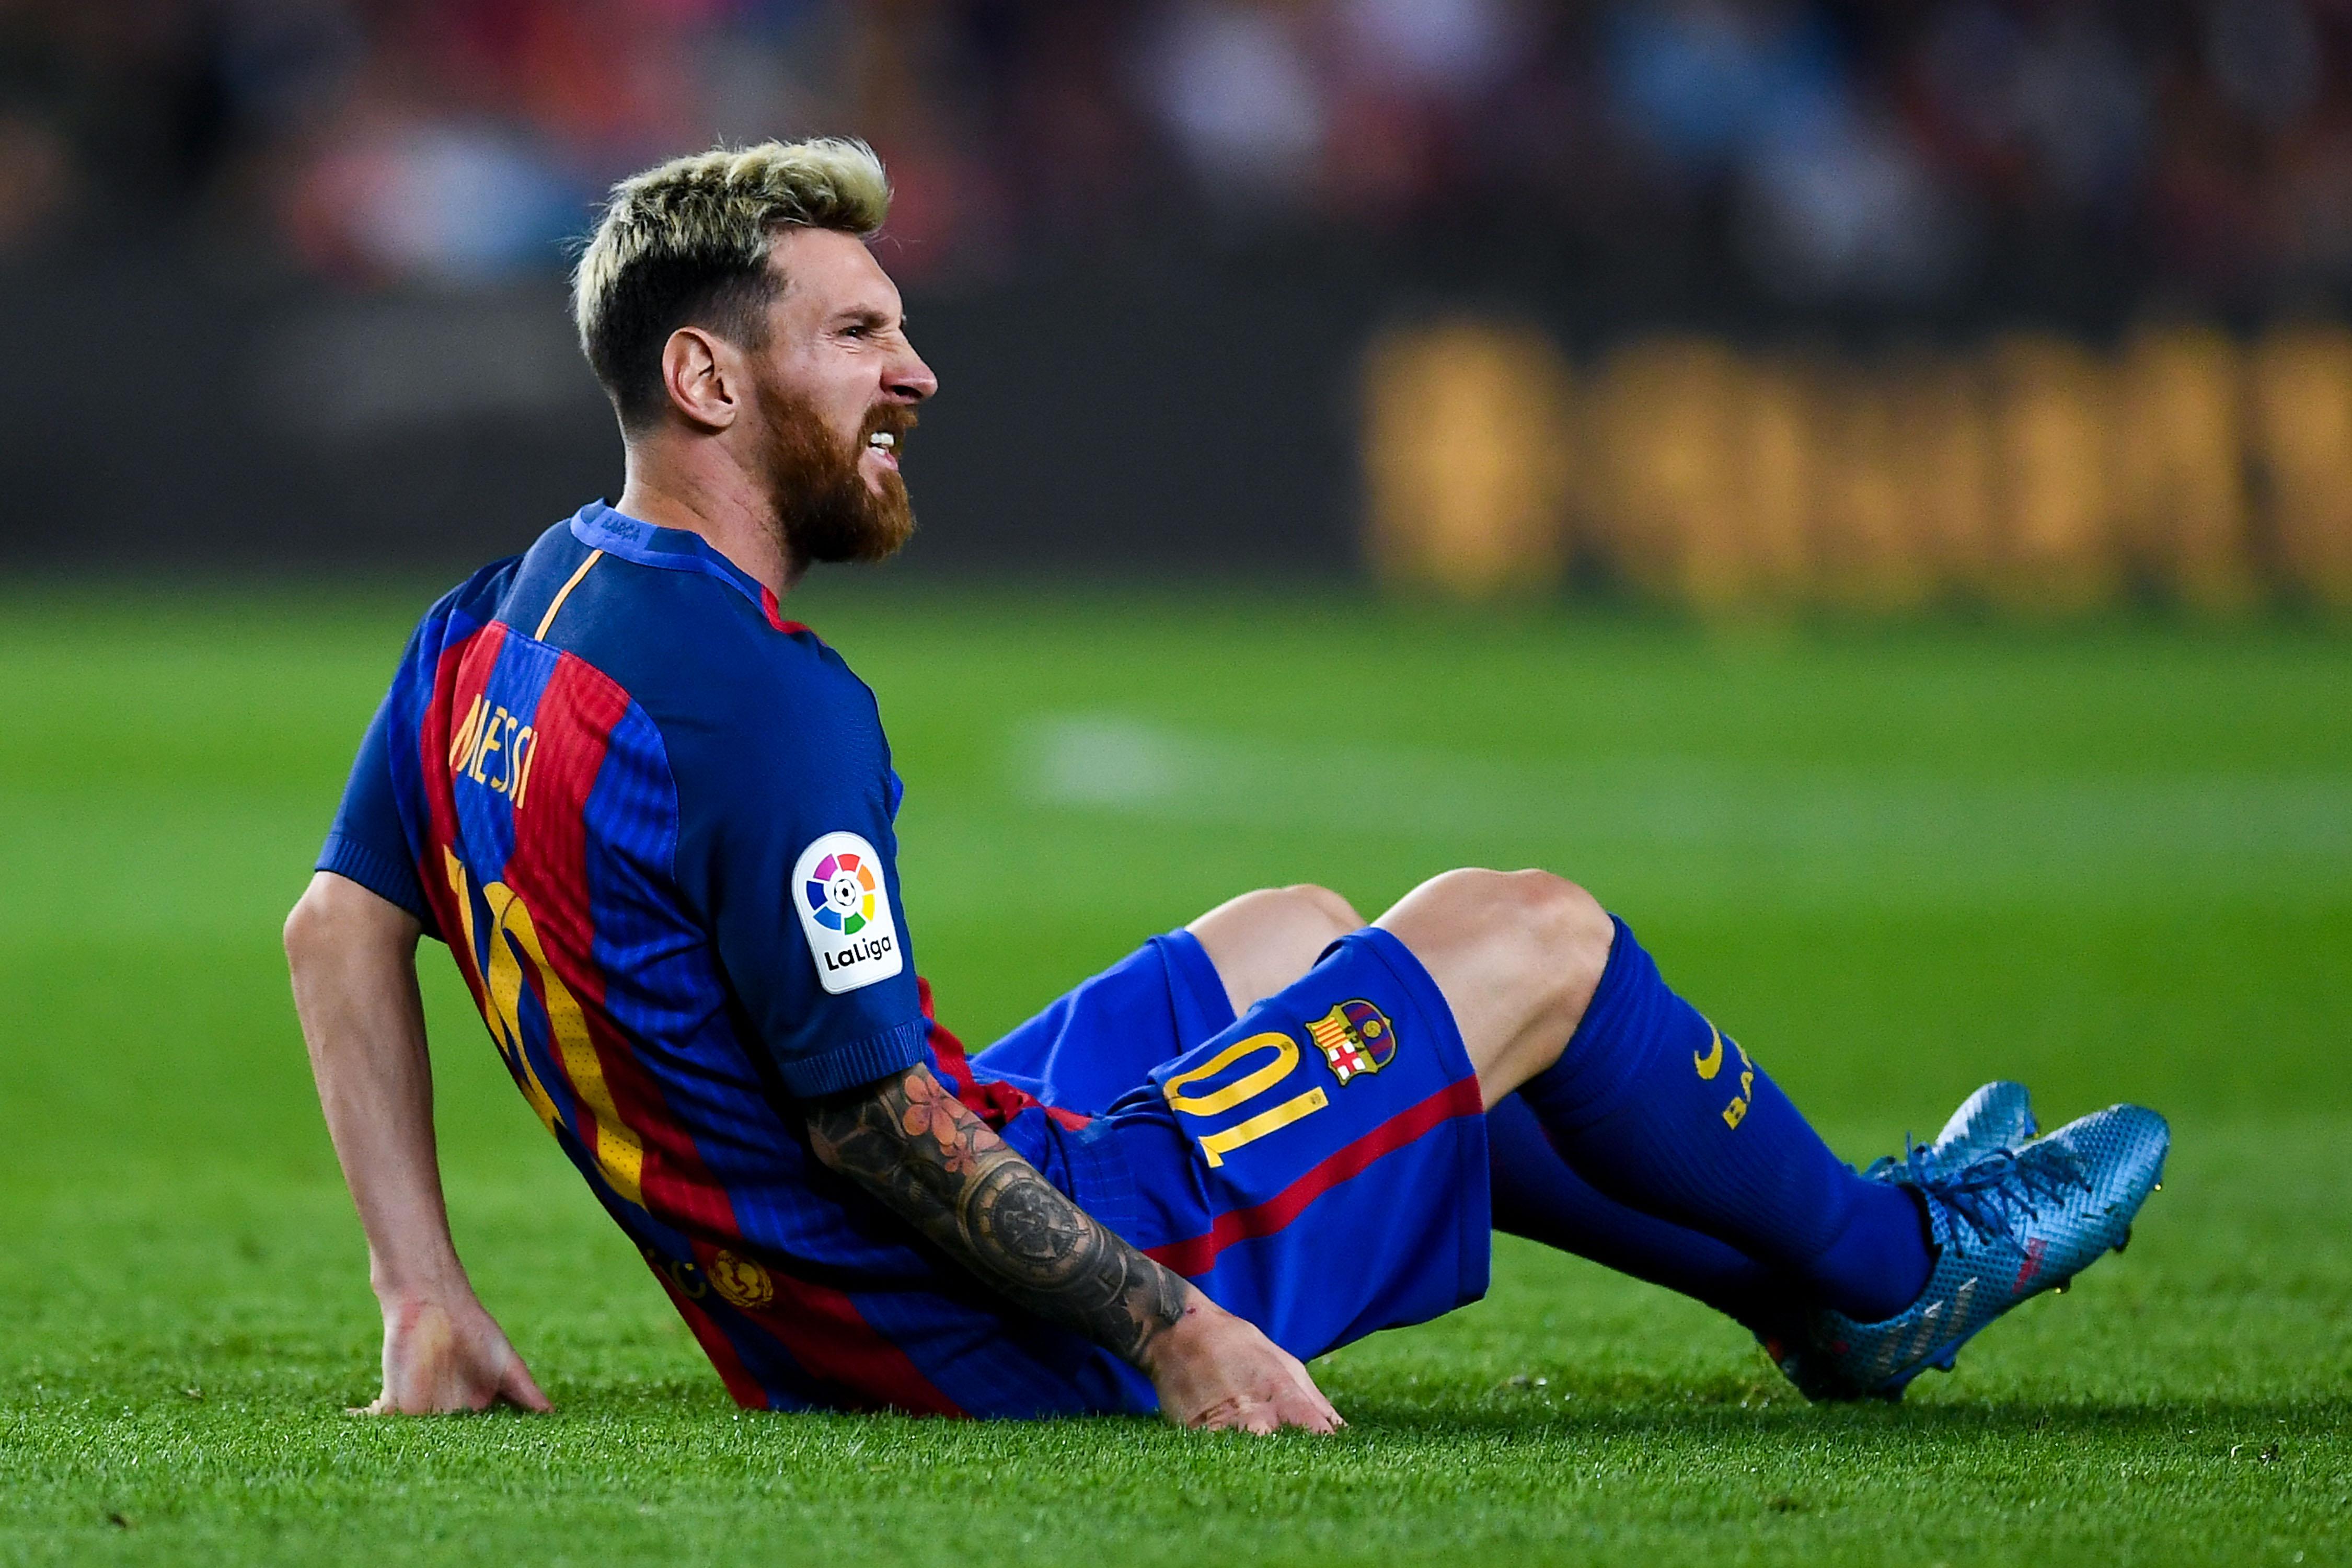 Sporting gijon vs barcelona live stream watch la liga online for Club de fumadores barcelona